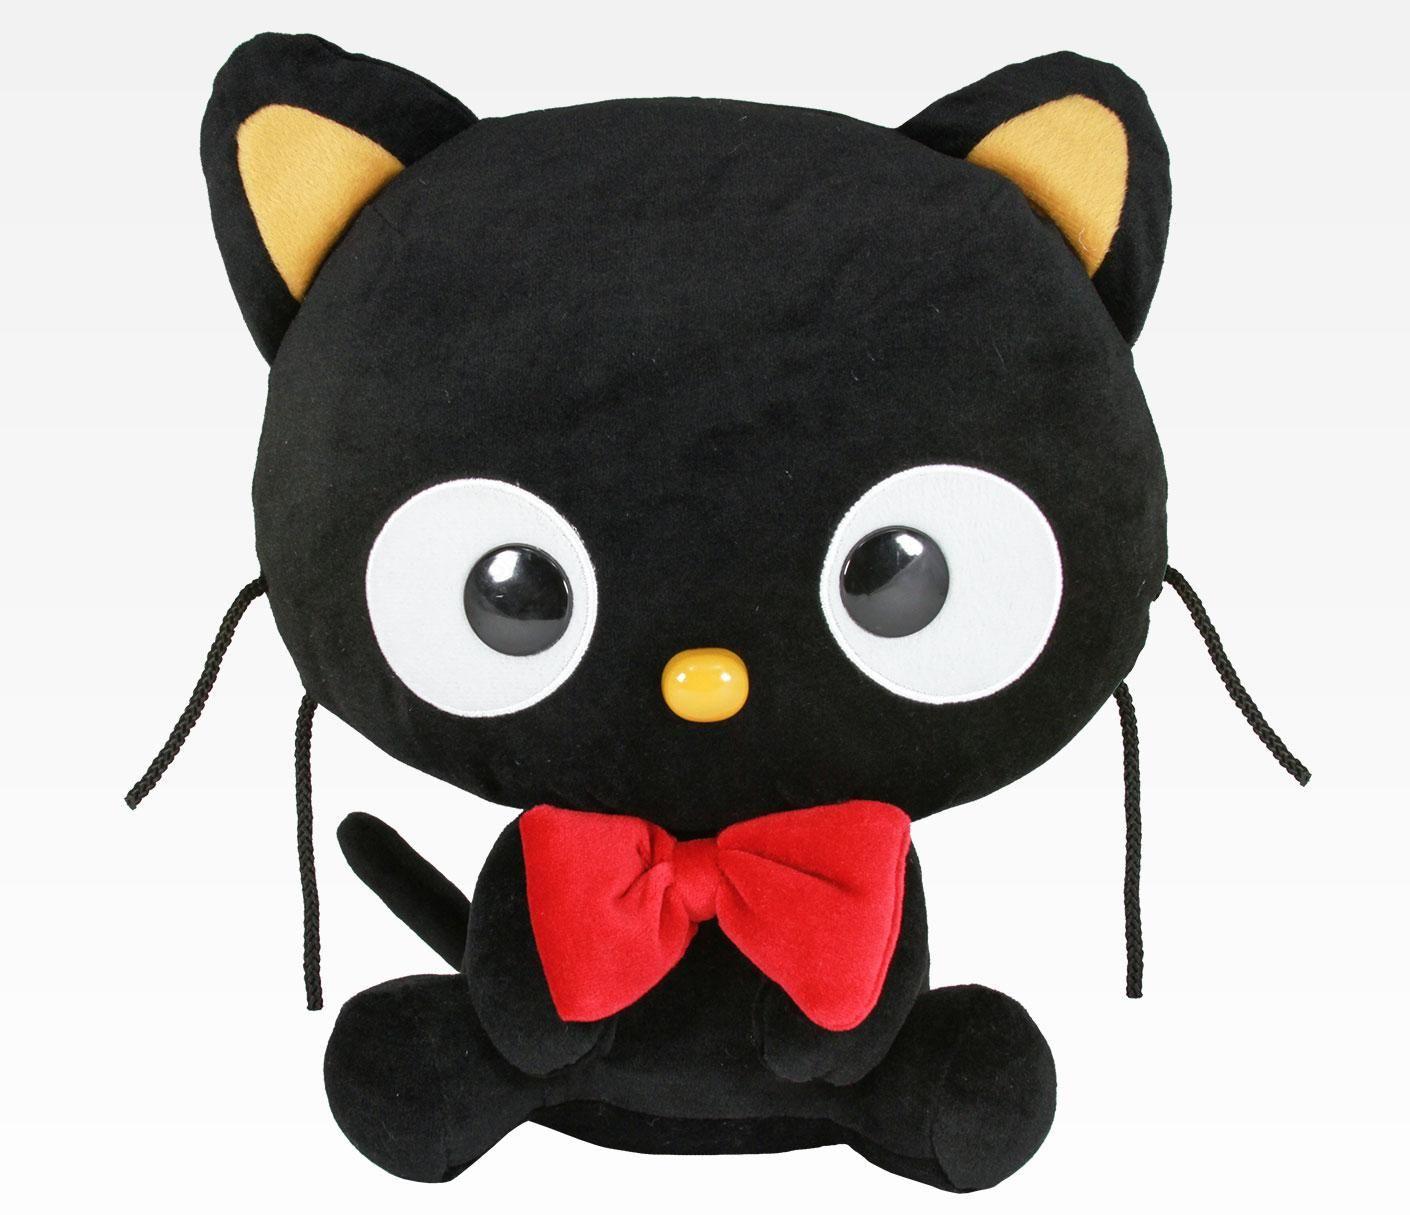 Predownload: Chococat 12 Plush Bowtie Kitty Hello Kitty Cat Plush [ 1215 x 1410 Pixel ]